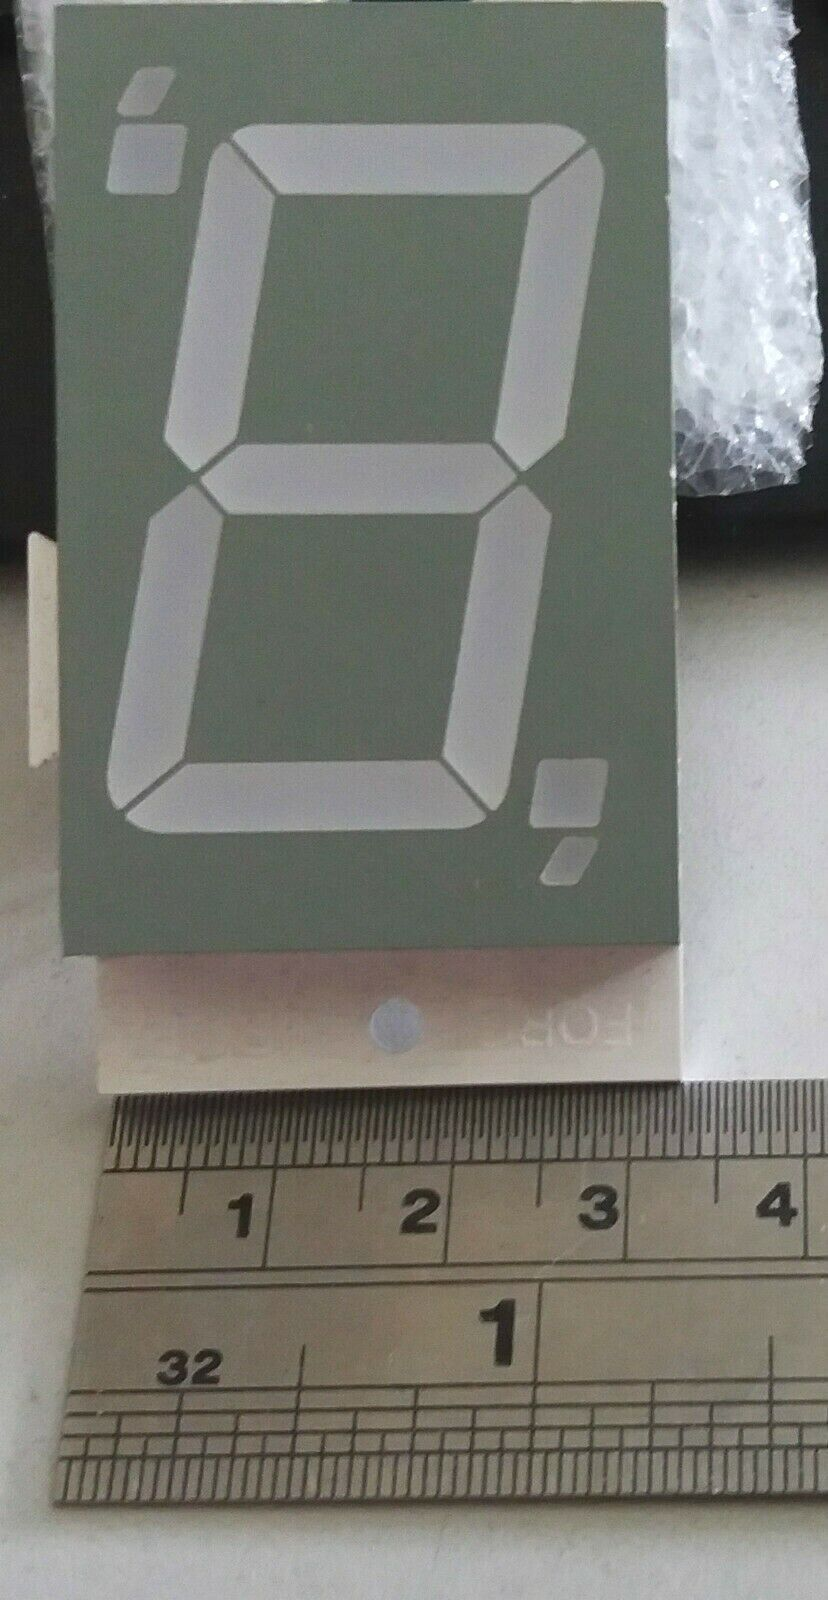 7 Segment LED Displays red interlocking pack of 5 segments 38mm x 60mm